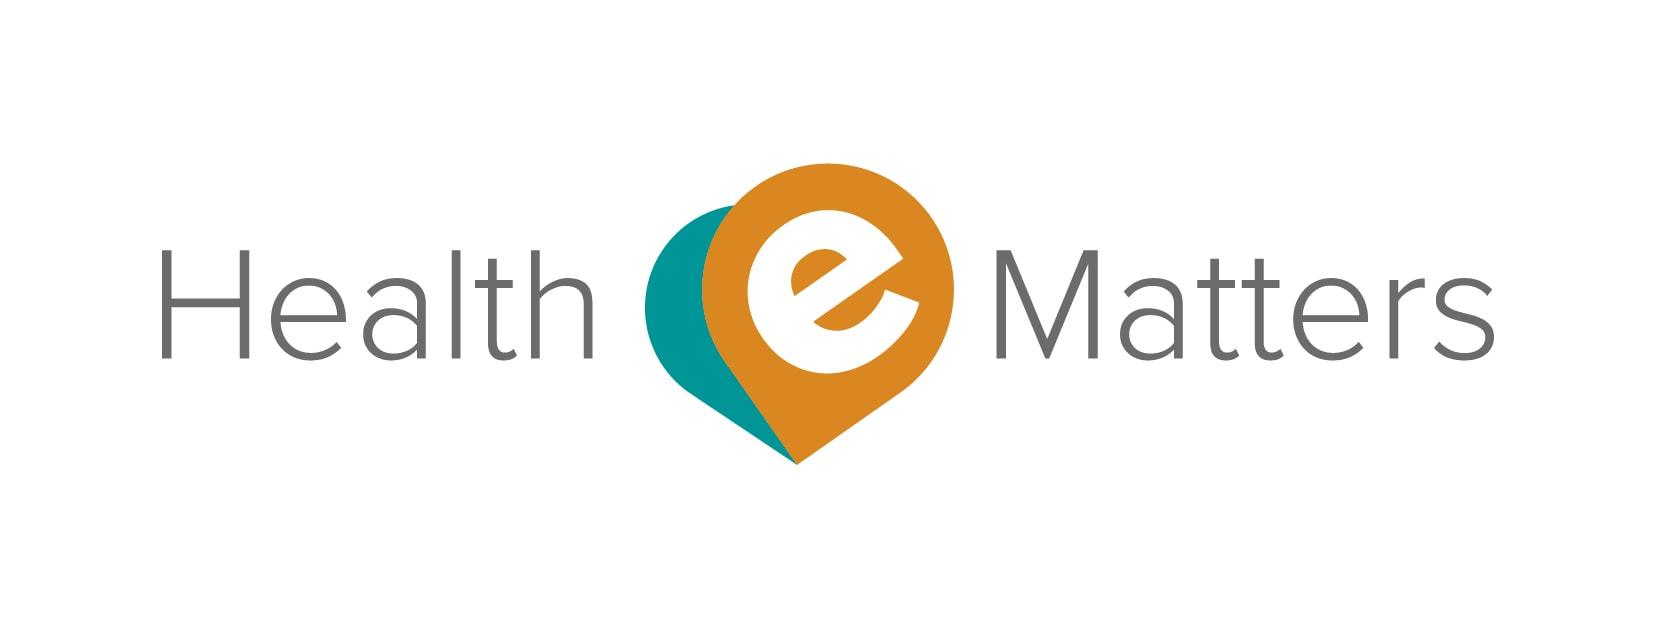 Health eMatters